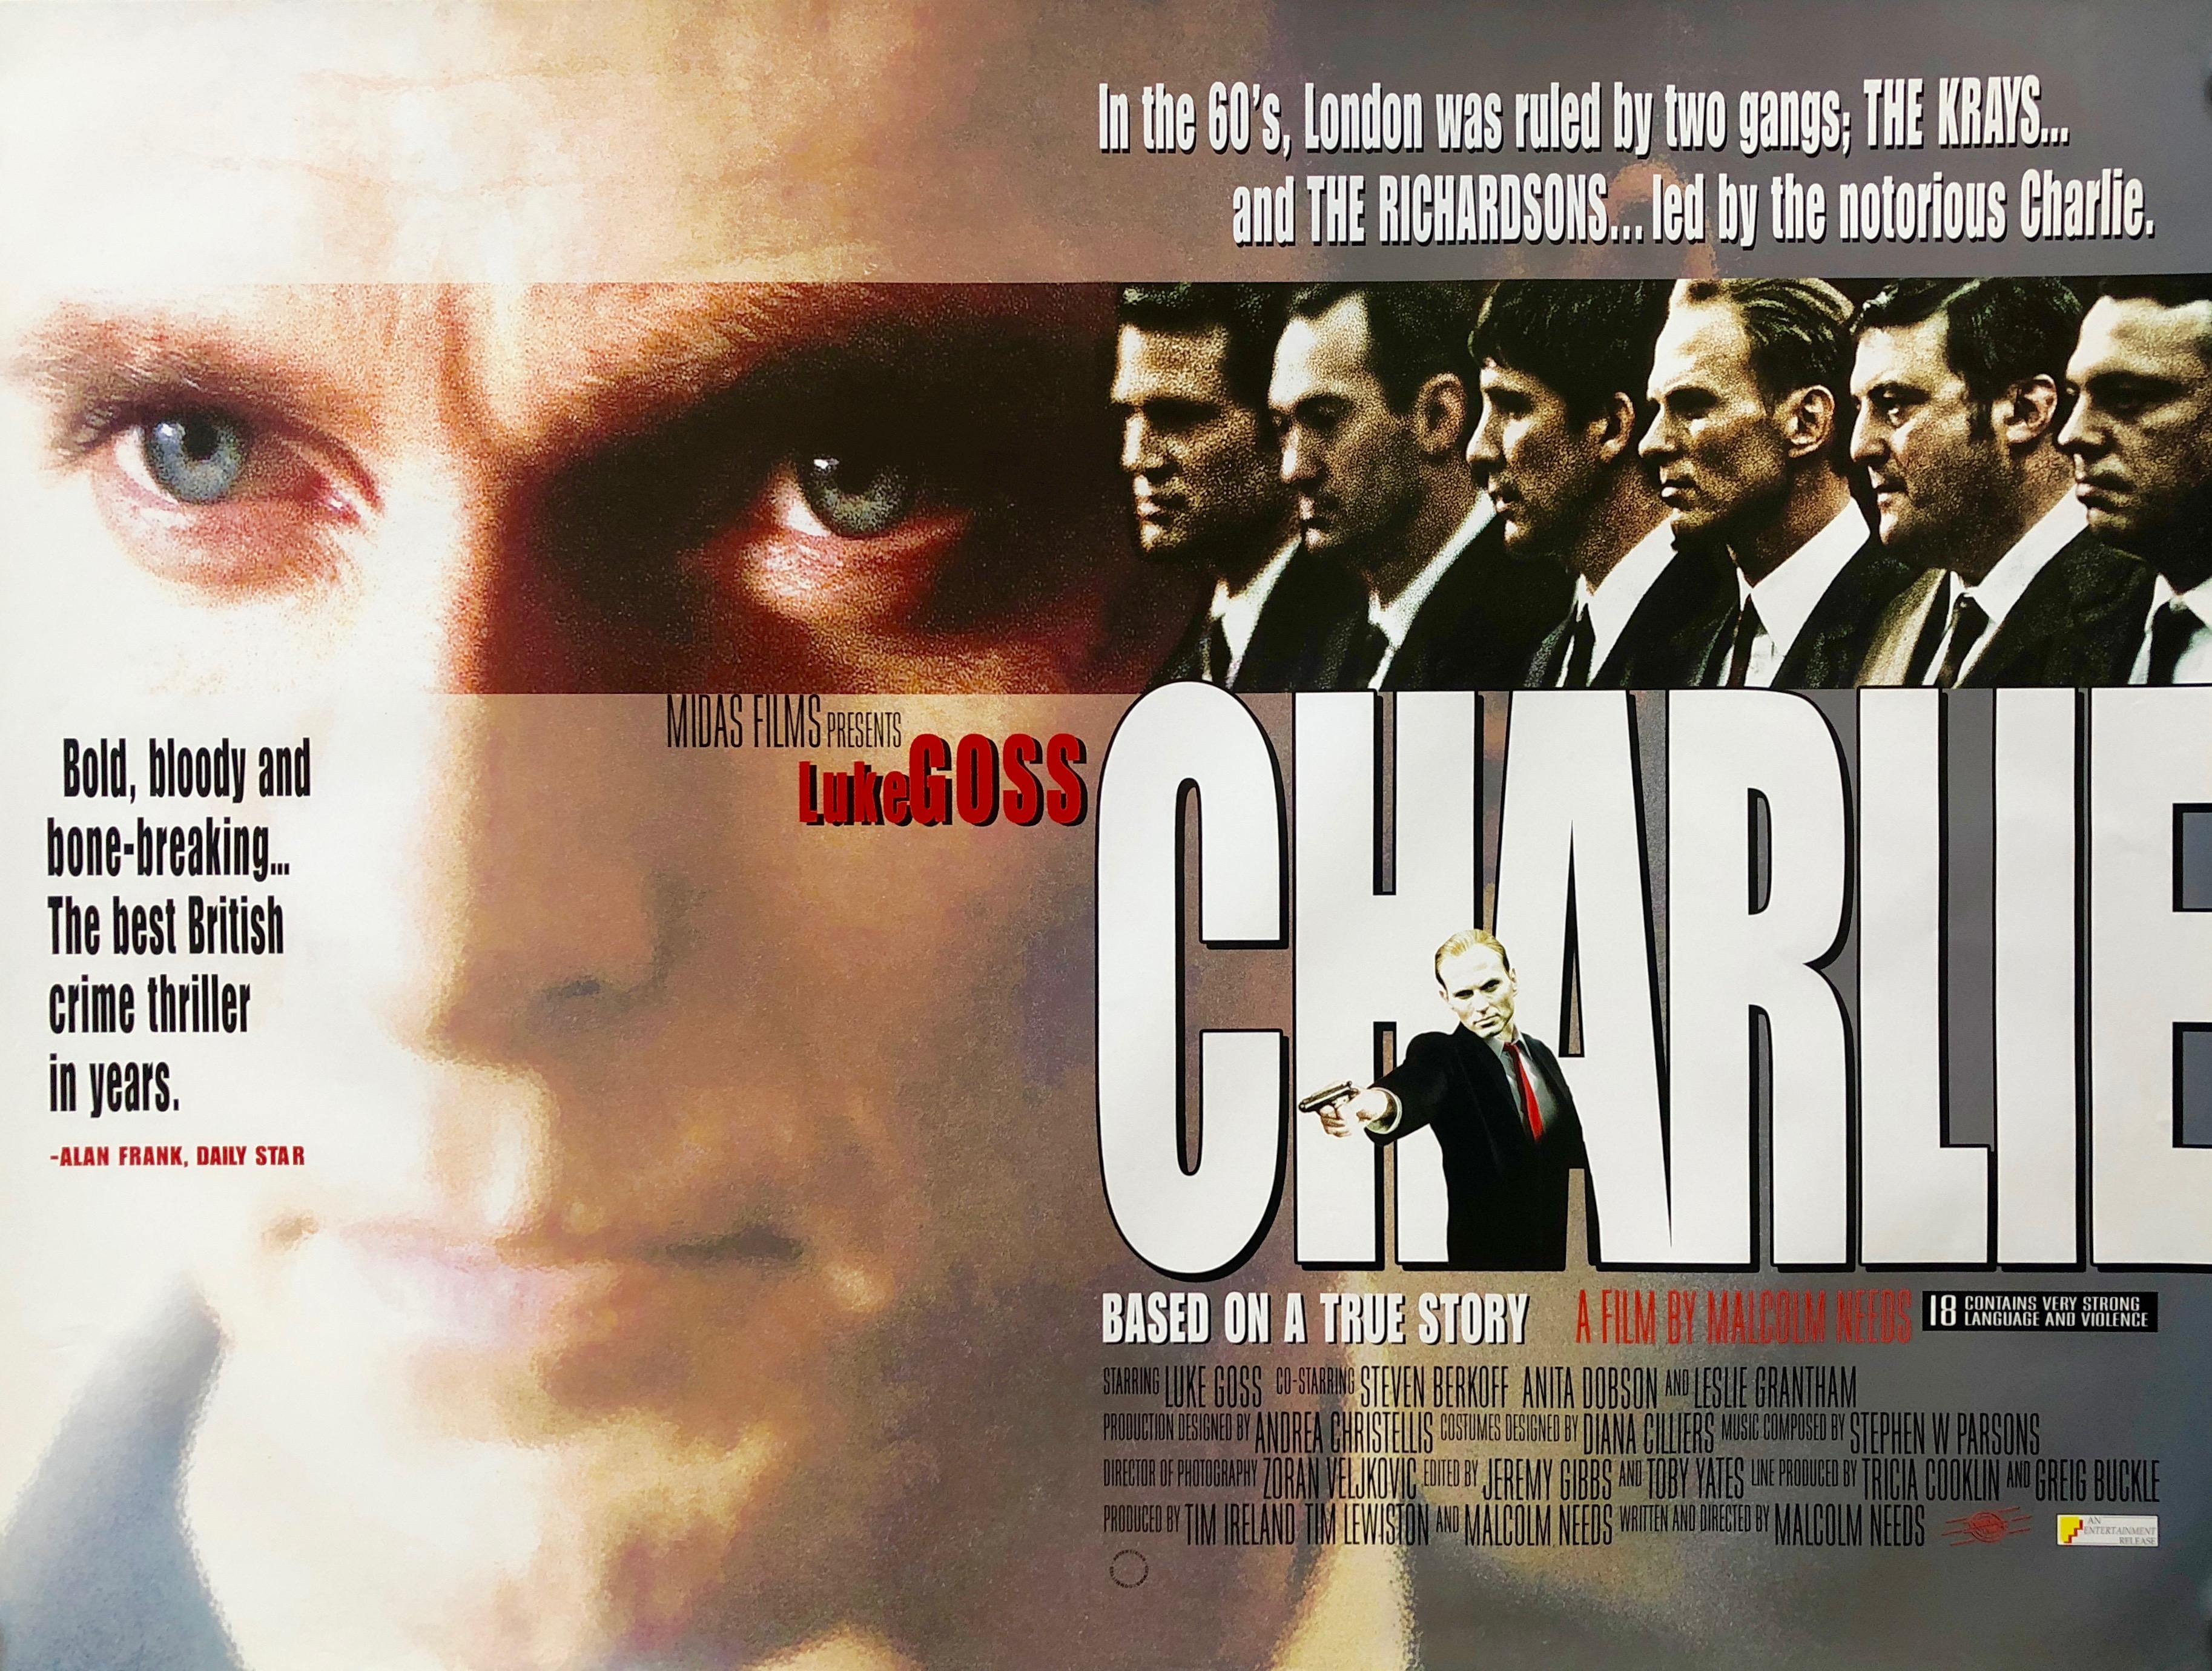 Charlie-Movie-Poster